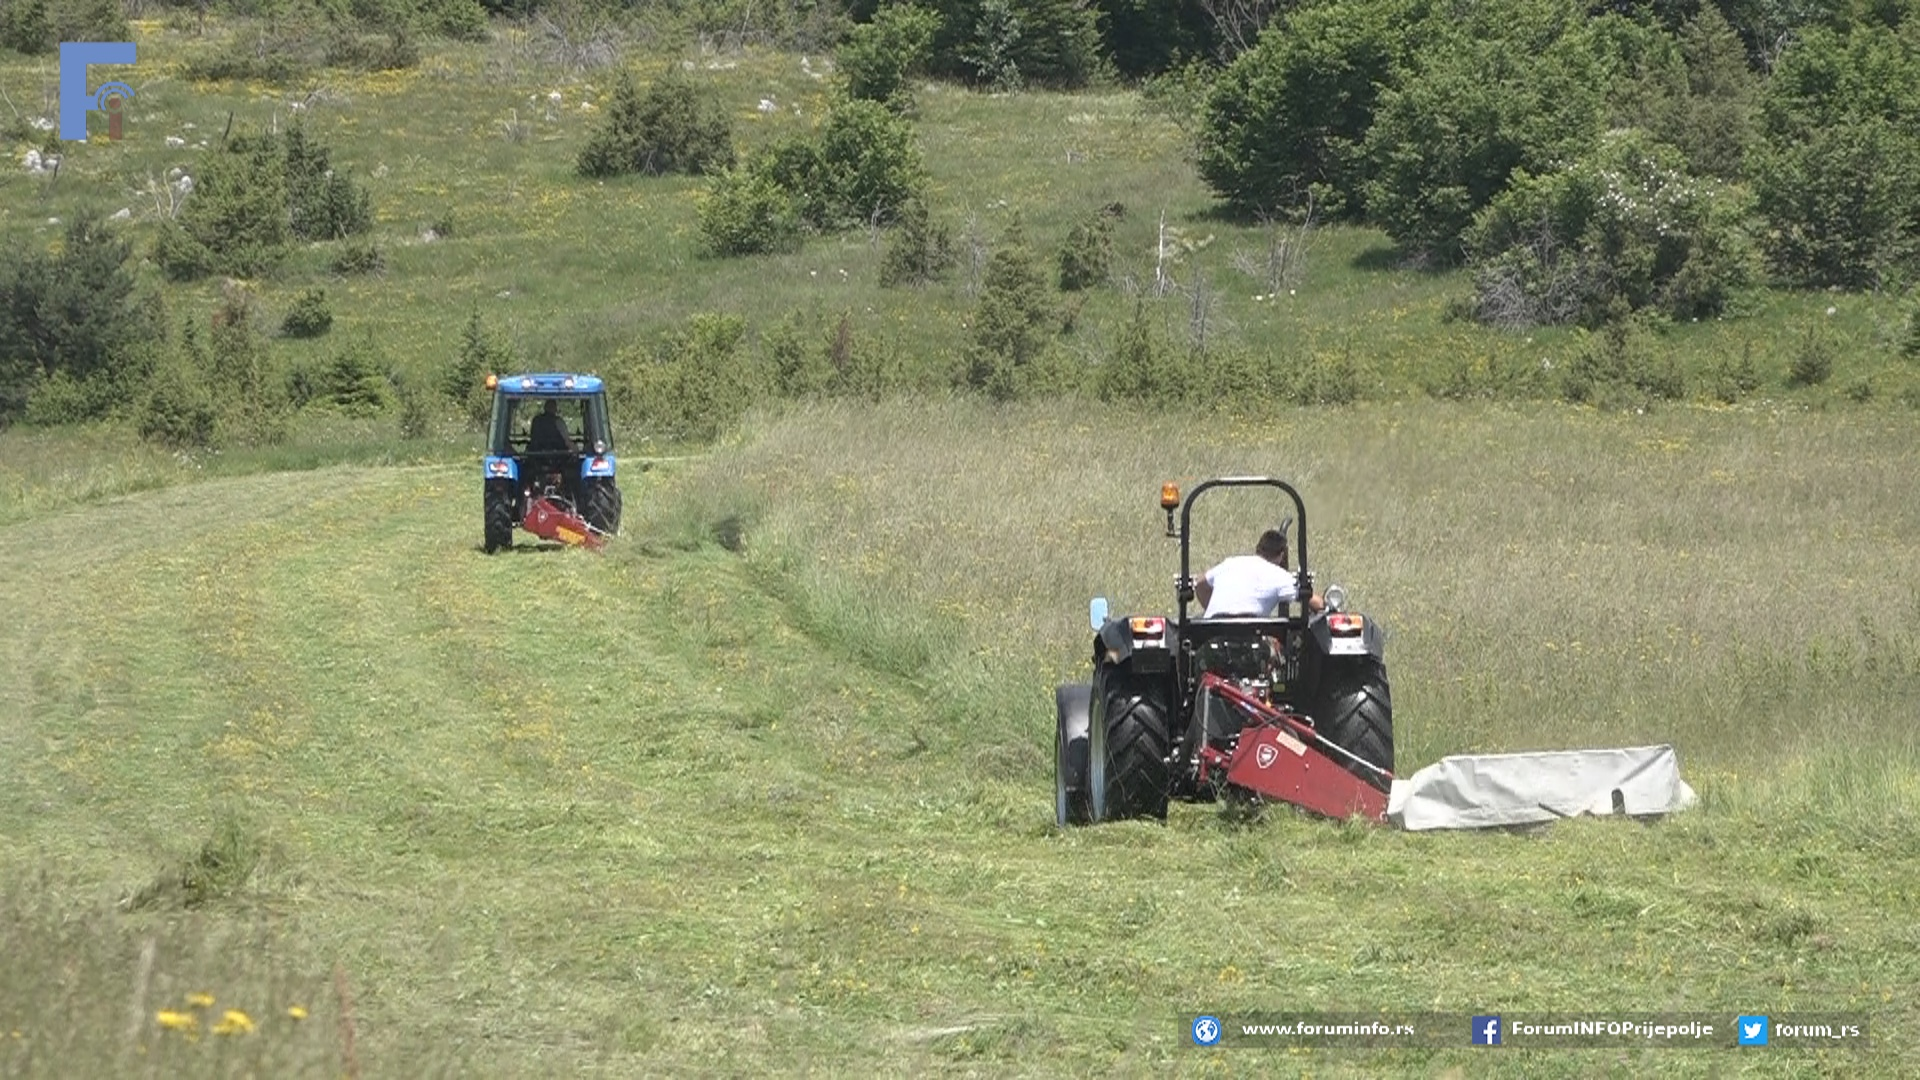 Подстицаји Министарства пољопривреде за набавку машина и опреме